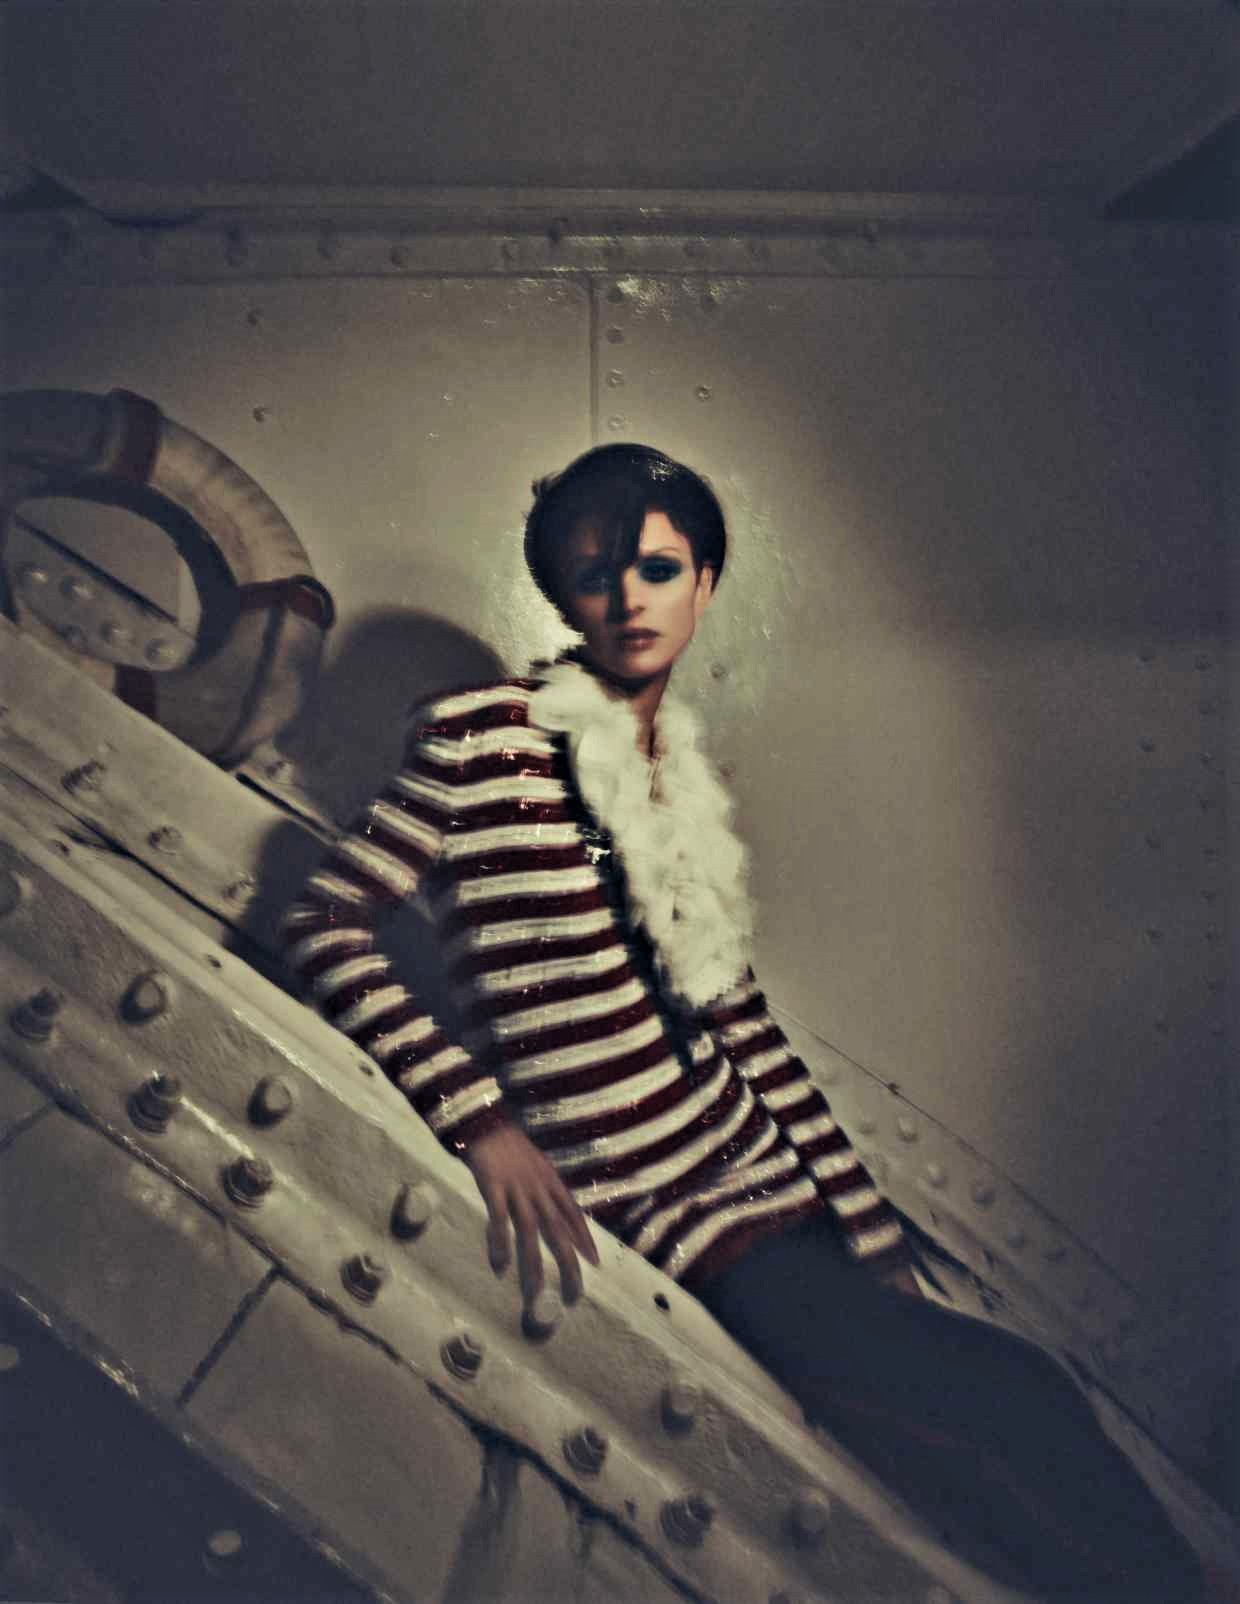 Nina Kojovic by Yuval Hen for HTSI Mag Cutty Sark (7).jpg